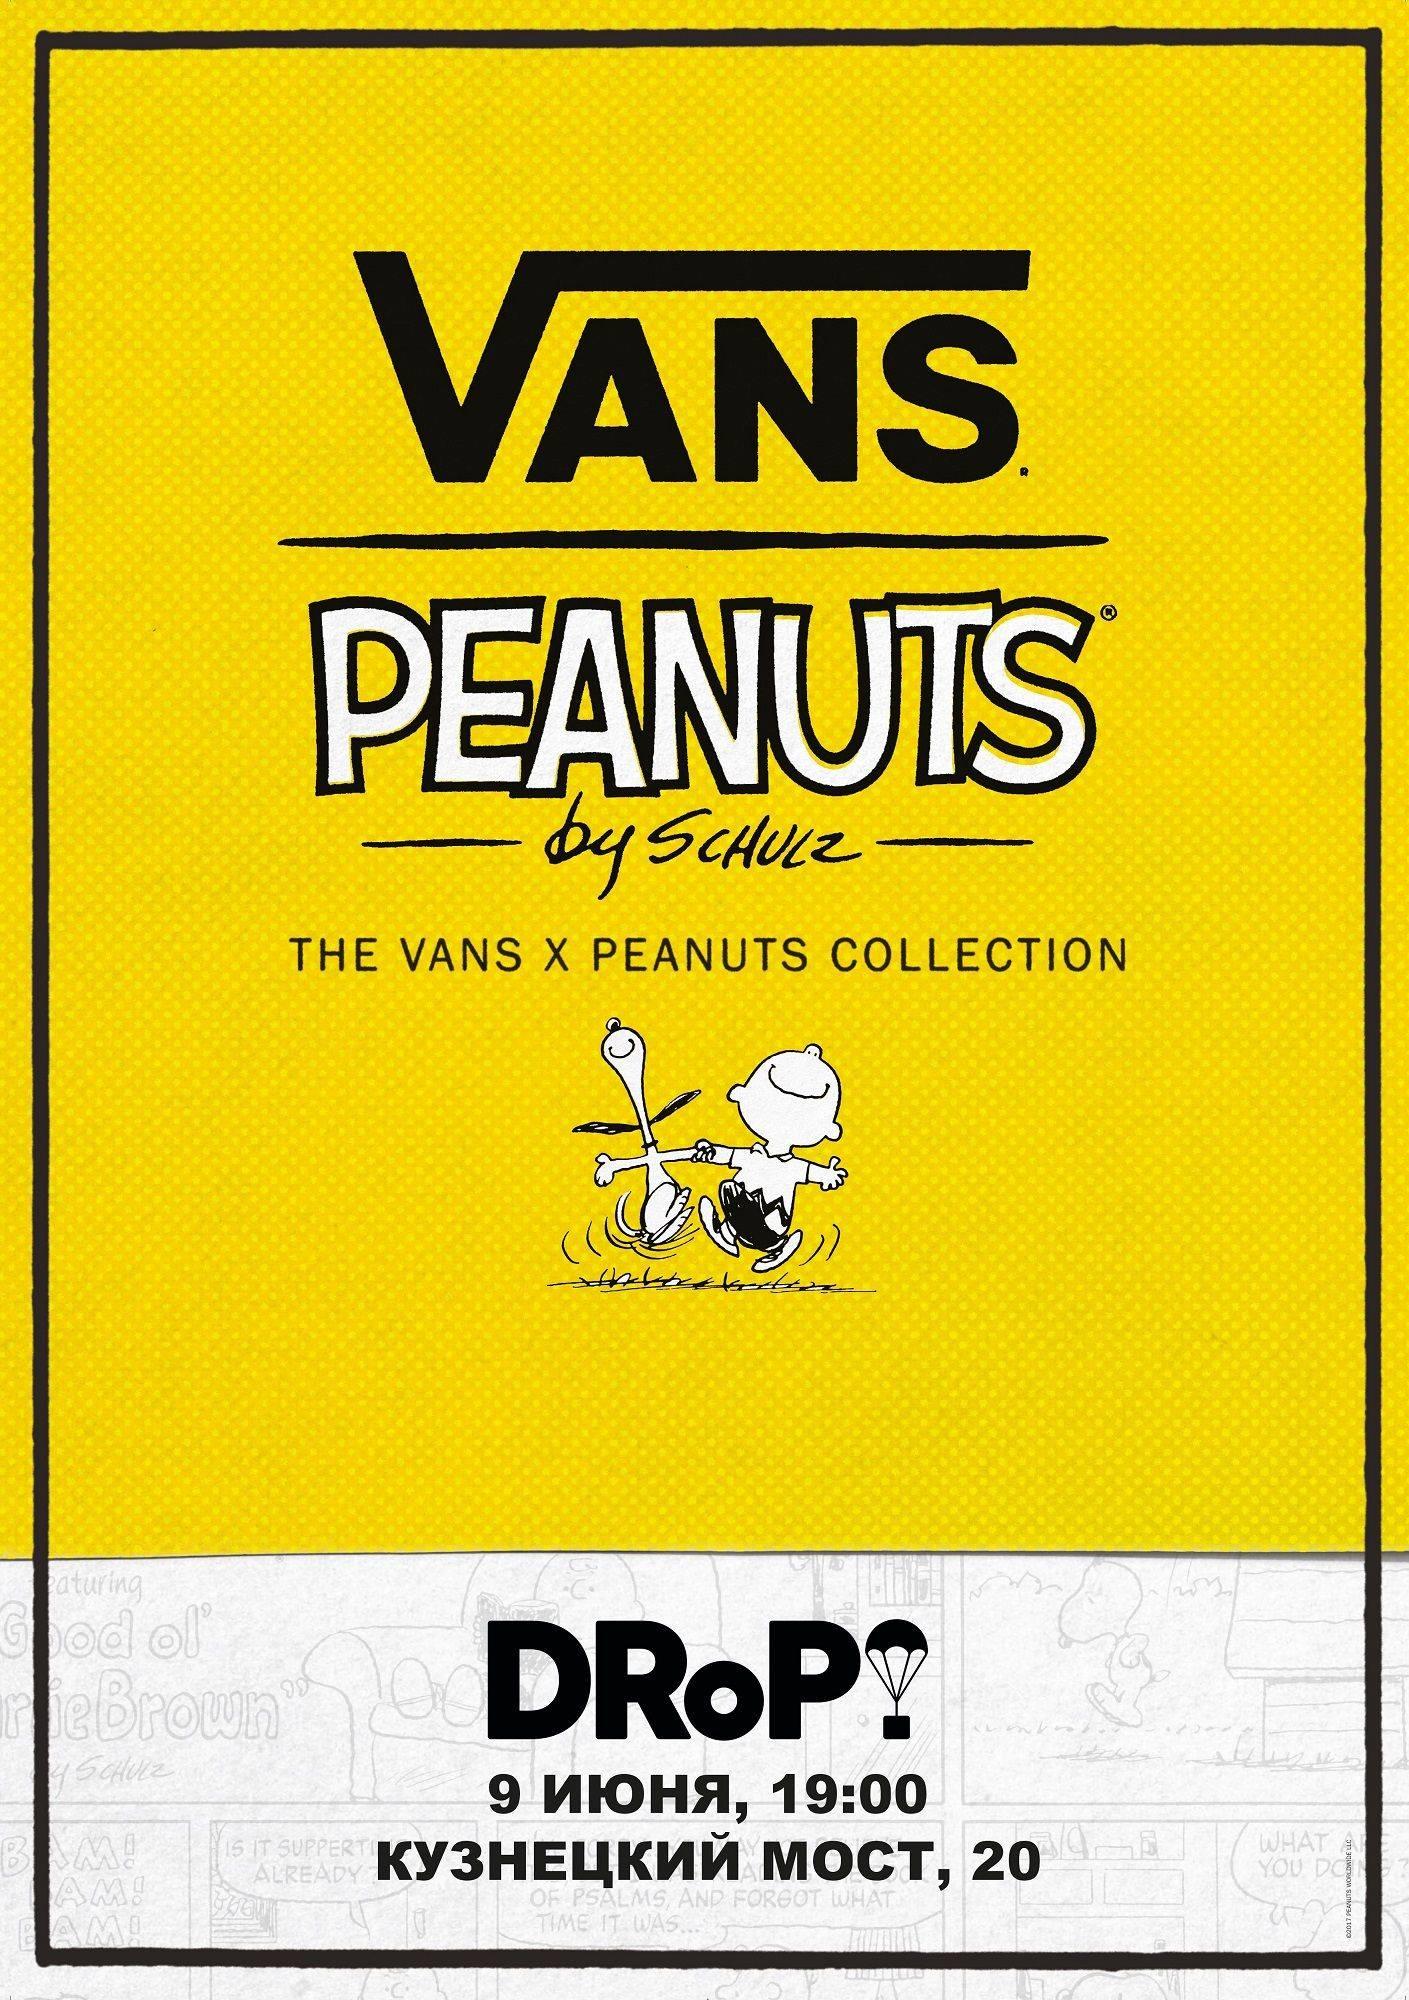 Коллаборация Vans x Peanuts - Stone Forest